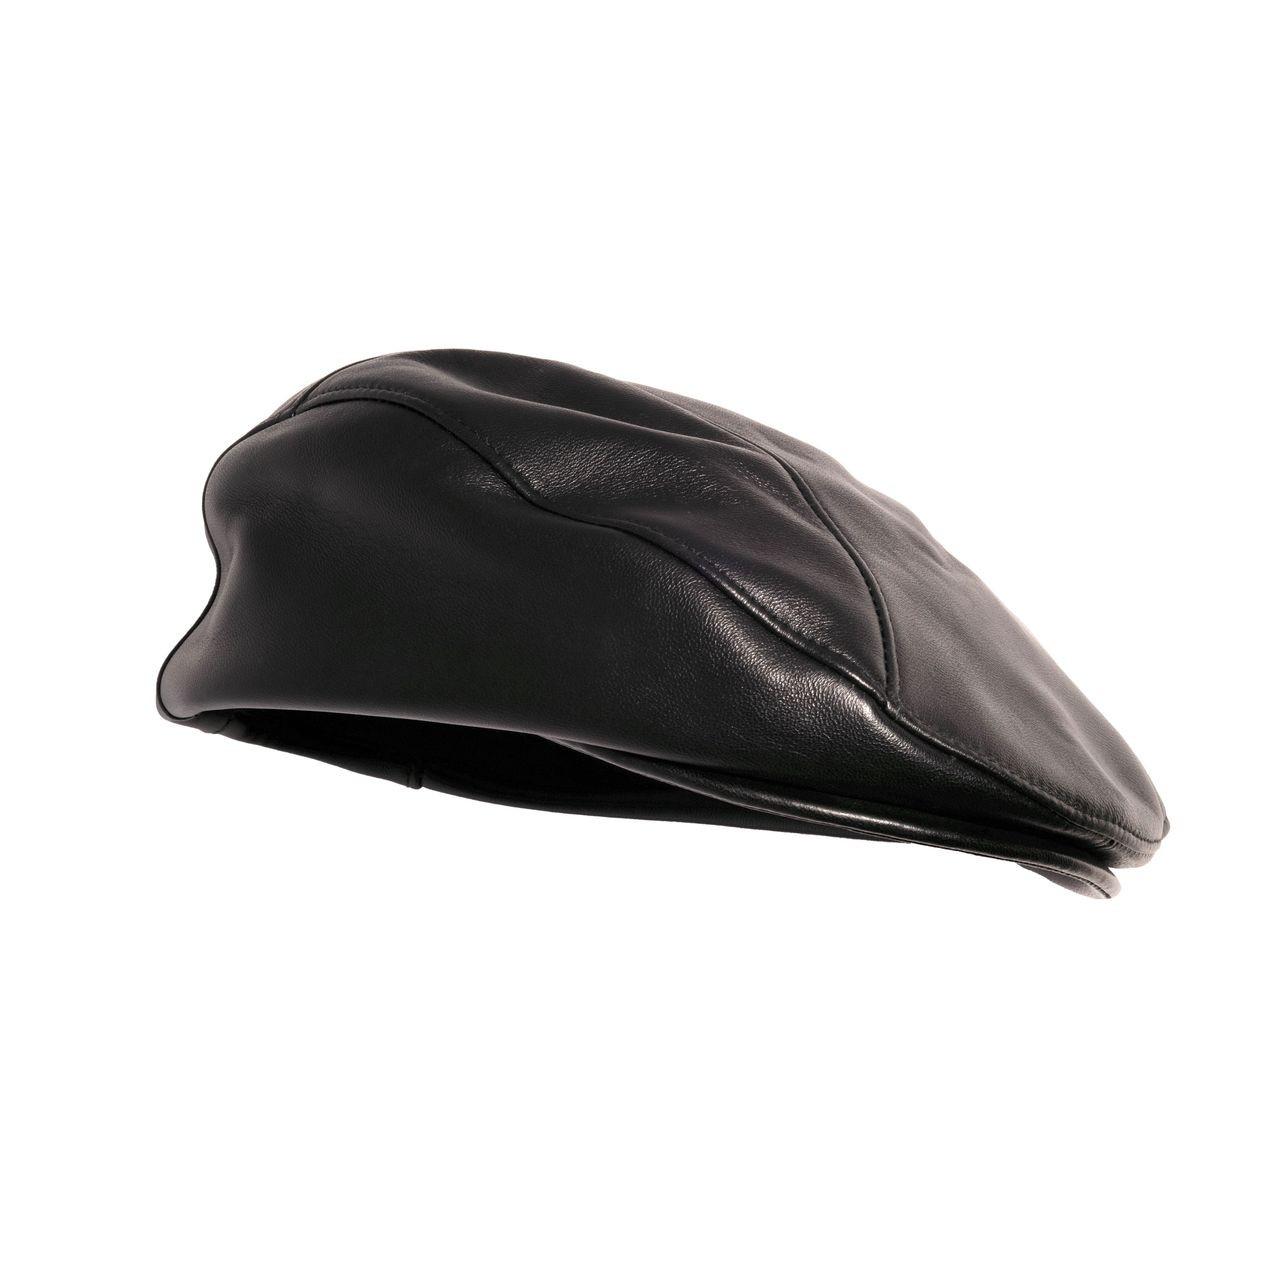 f4c1031865c48b Mi Woollies Lambskin Cheesecutter Hat - Online Shopping